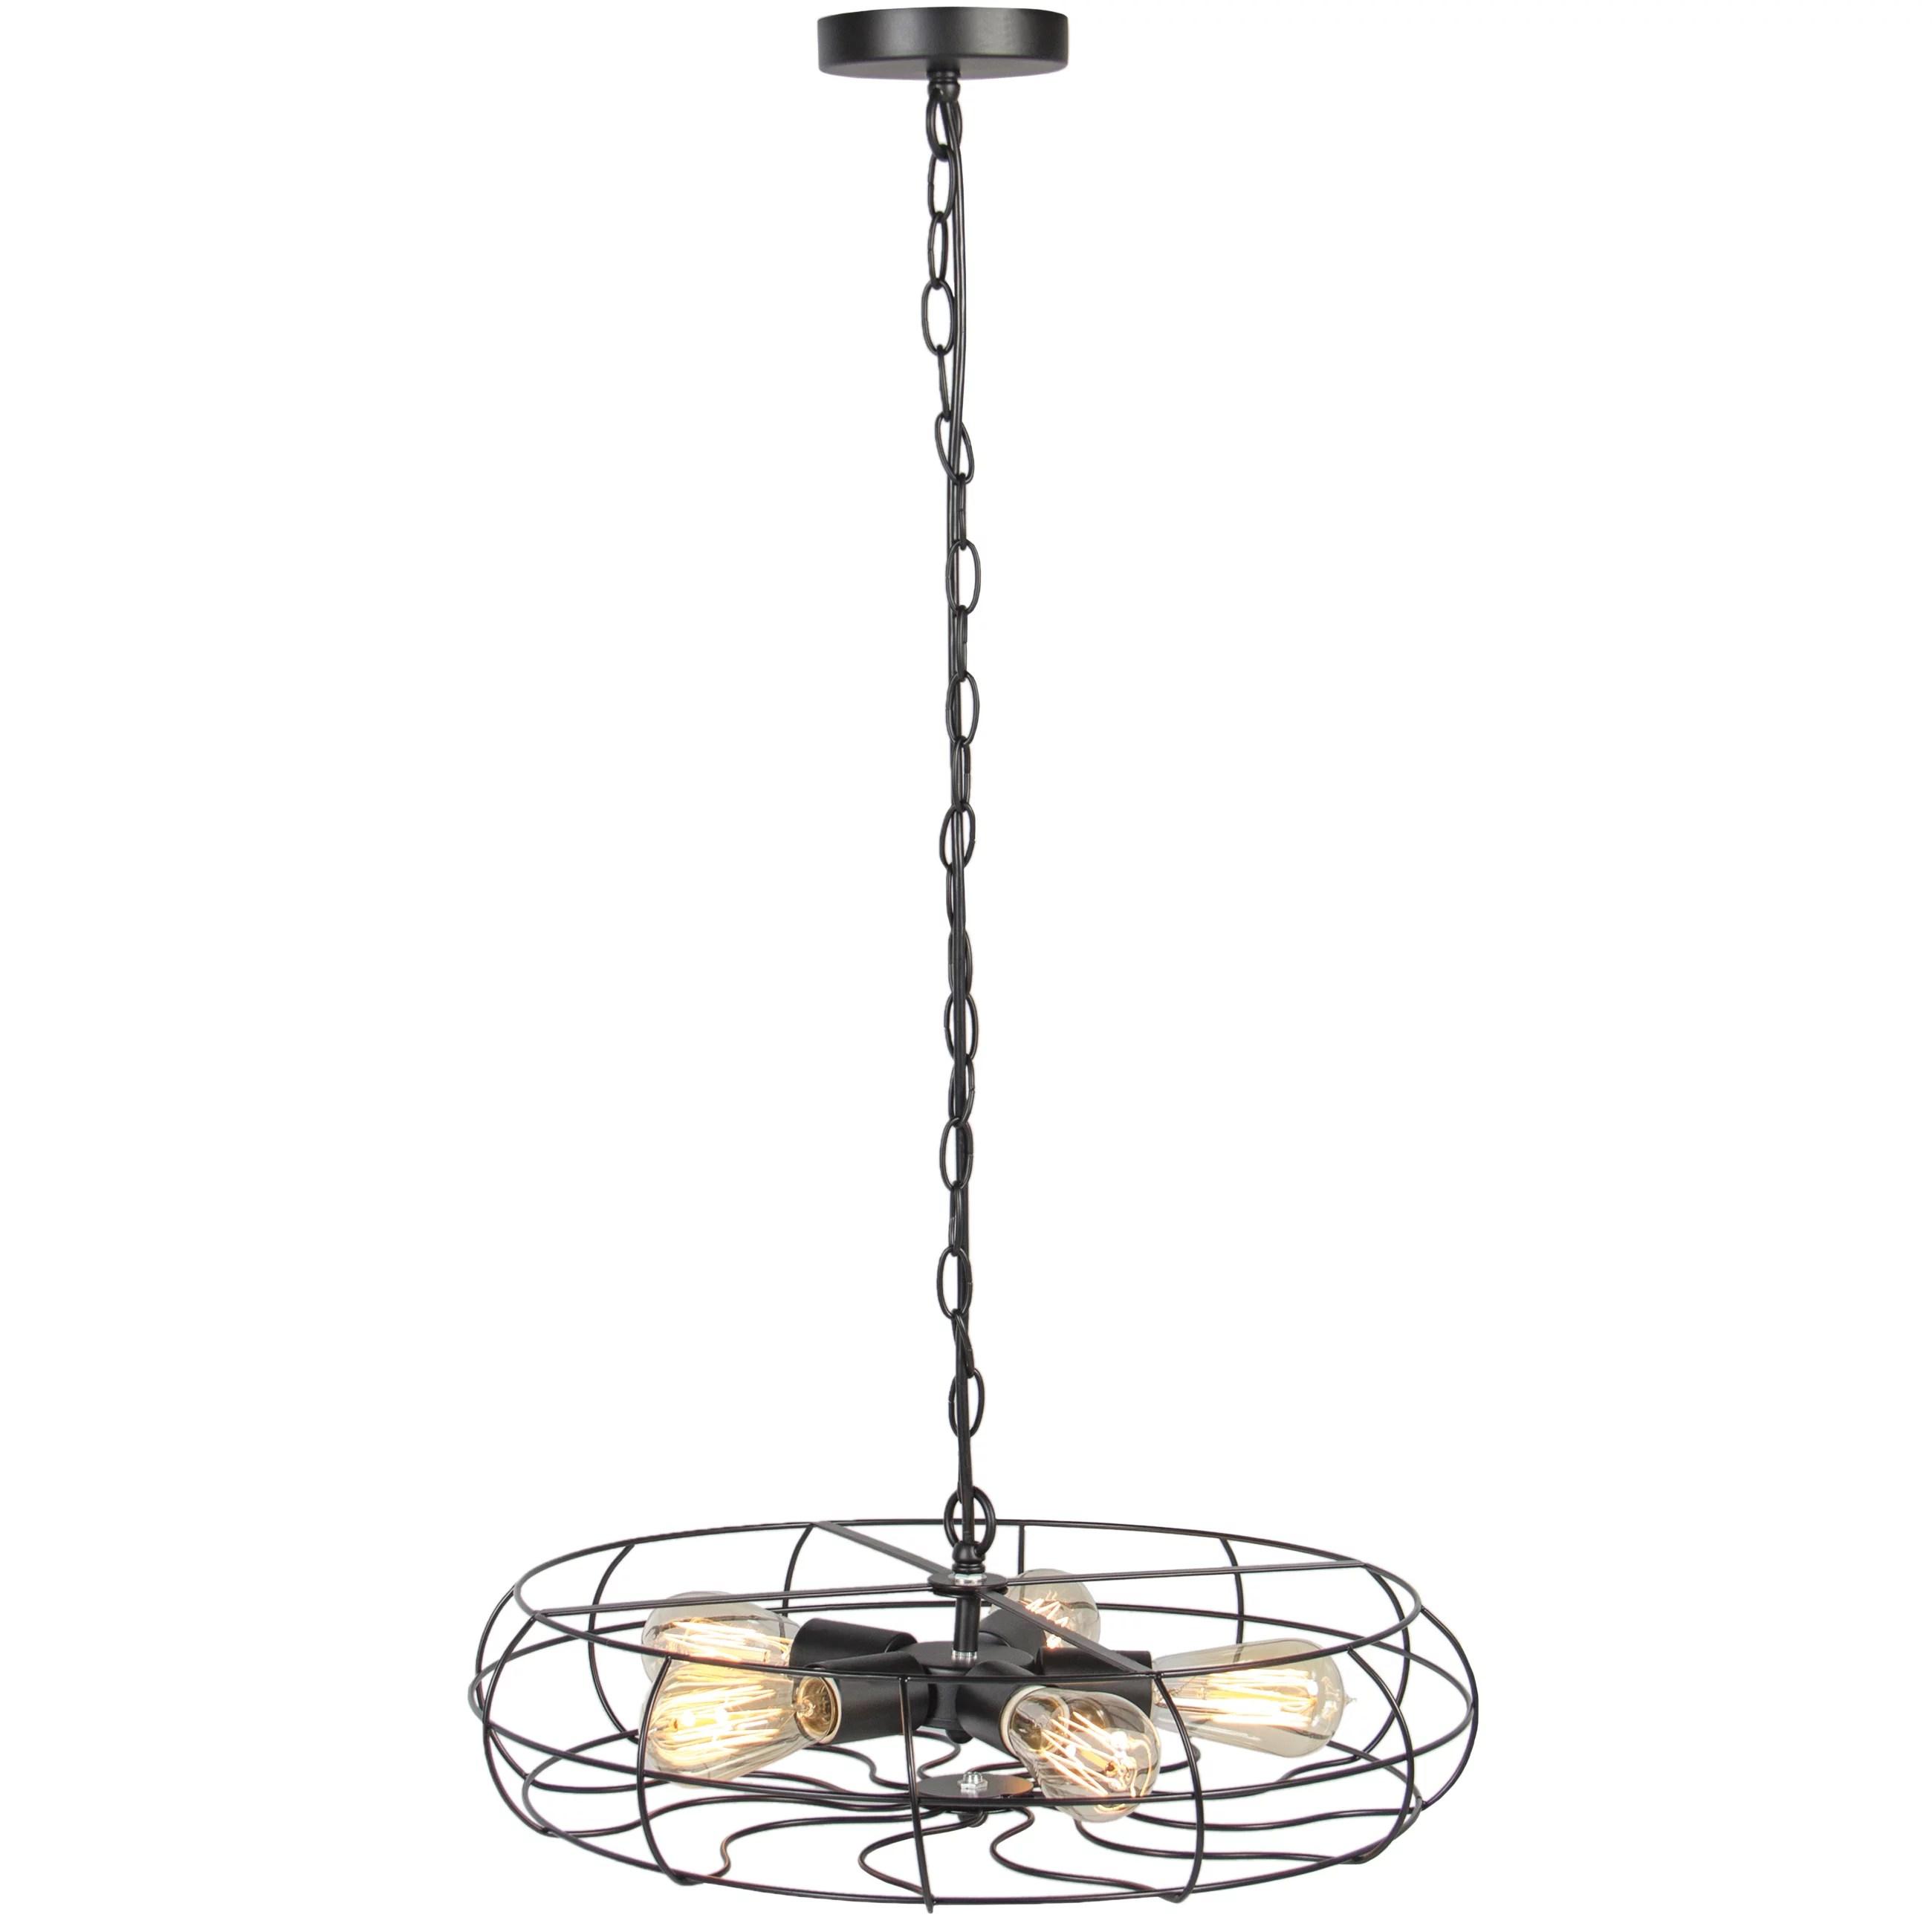 Industrial Vintage 5 Chandelier Ceiling Lighting Lights